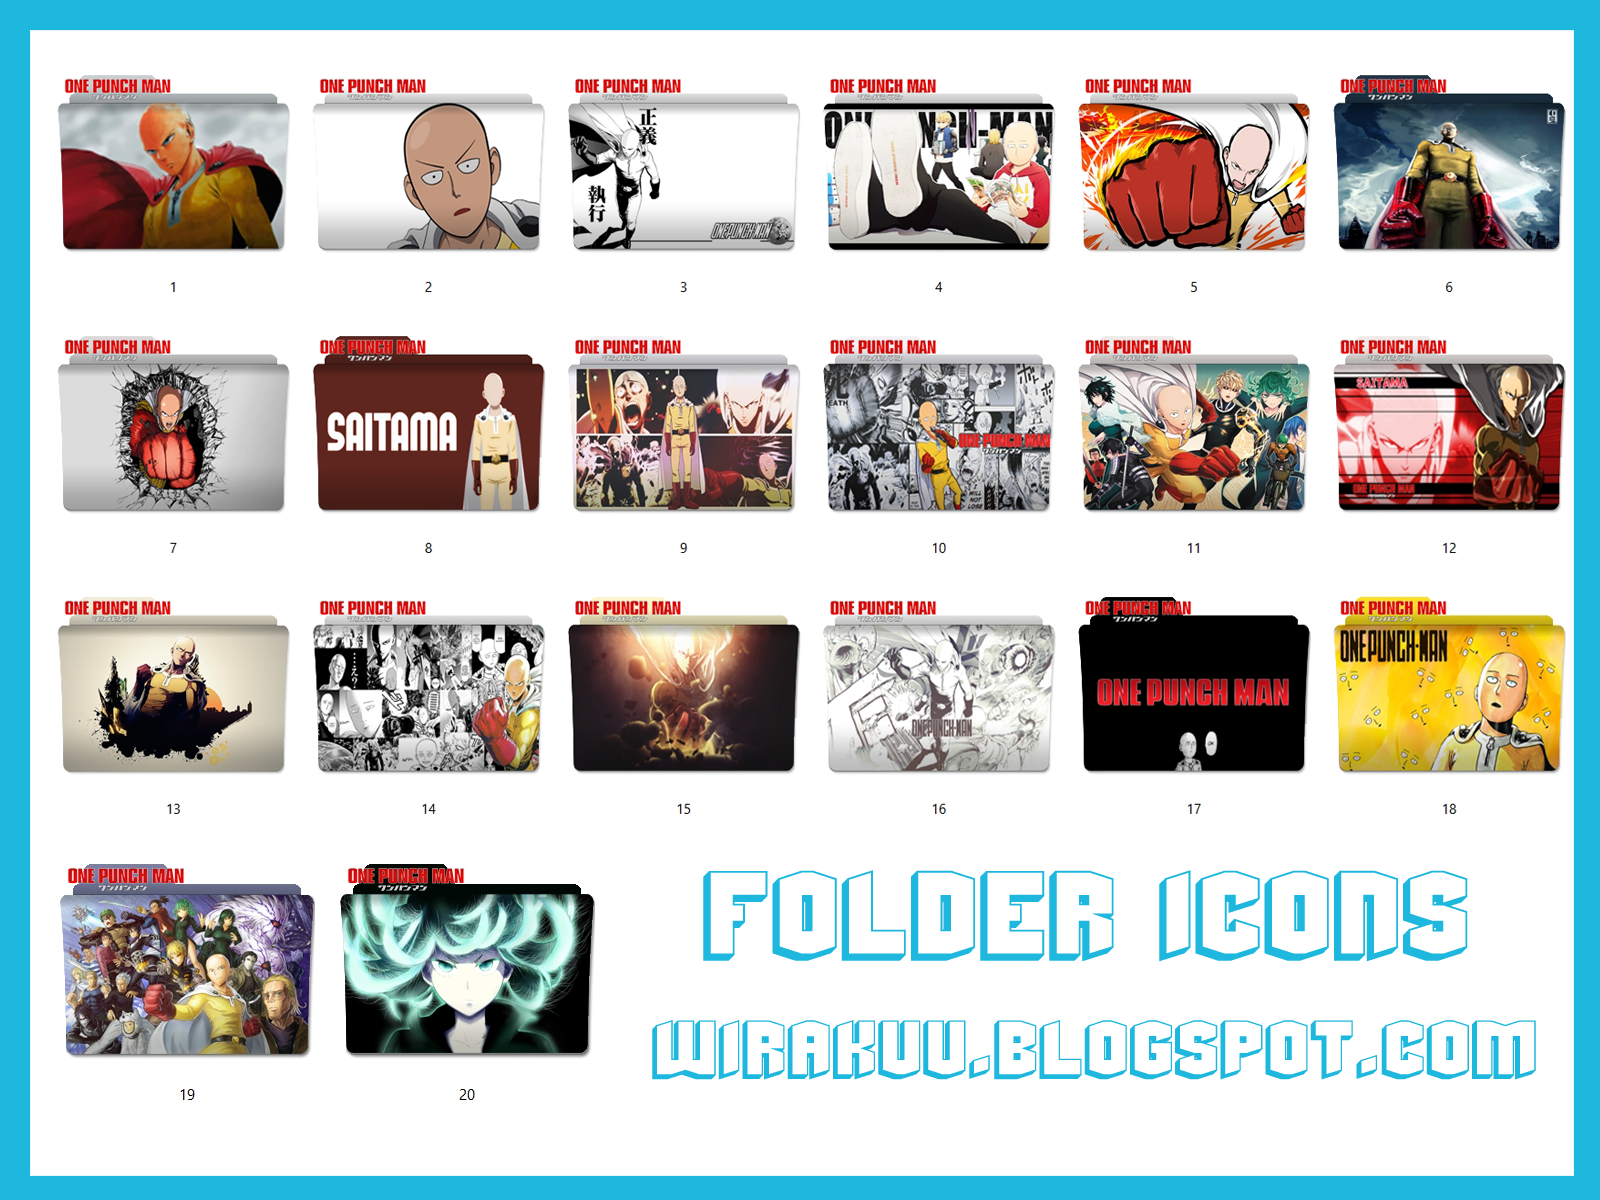 20 Folder Icons Anime One Punch Man Pack 2 (Windows 7, 8, 10)